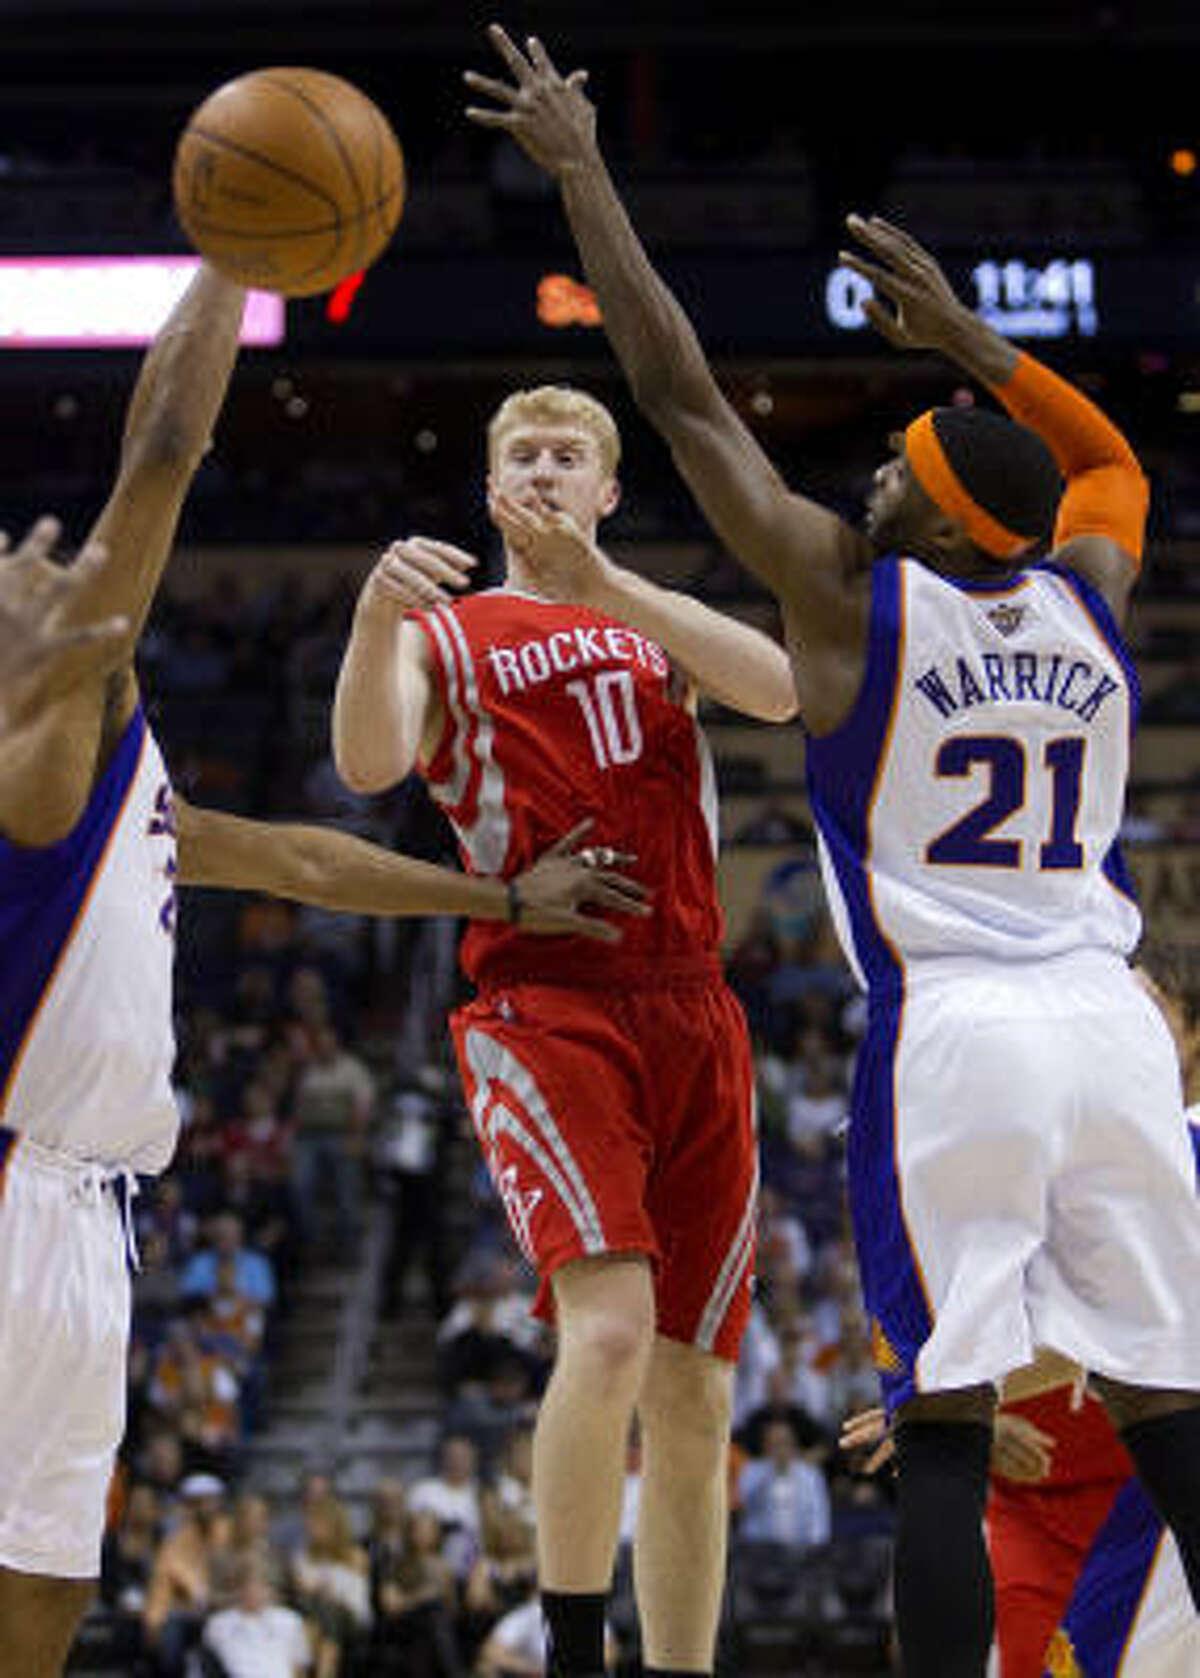 Rockets forward Chase Budinger (10) passes as Suns forward Hakim Warrick (21) defends.